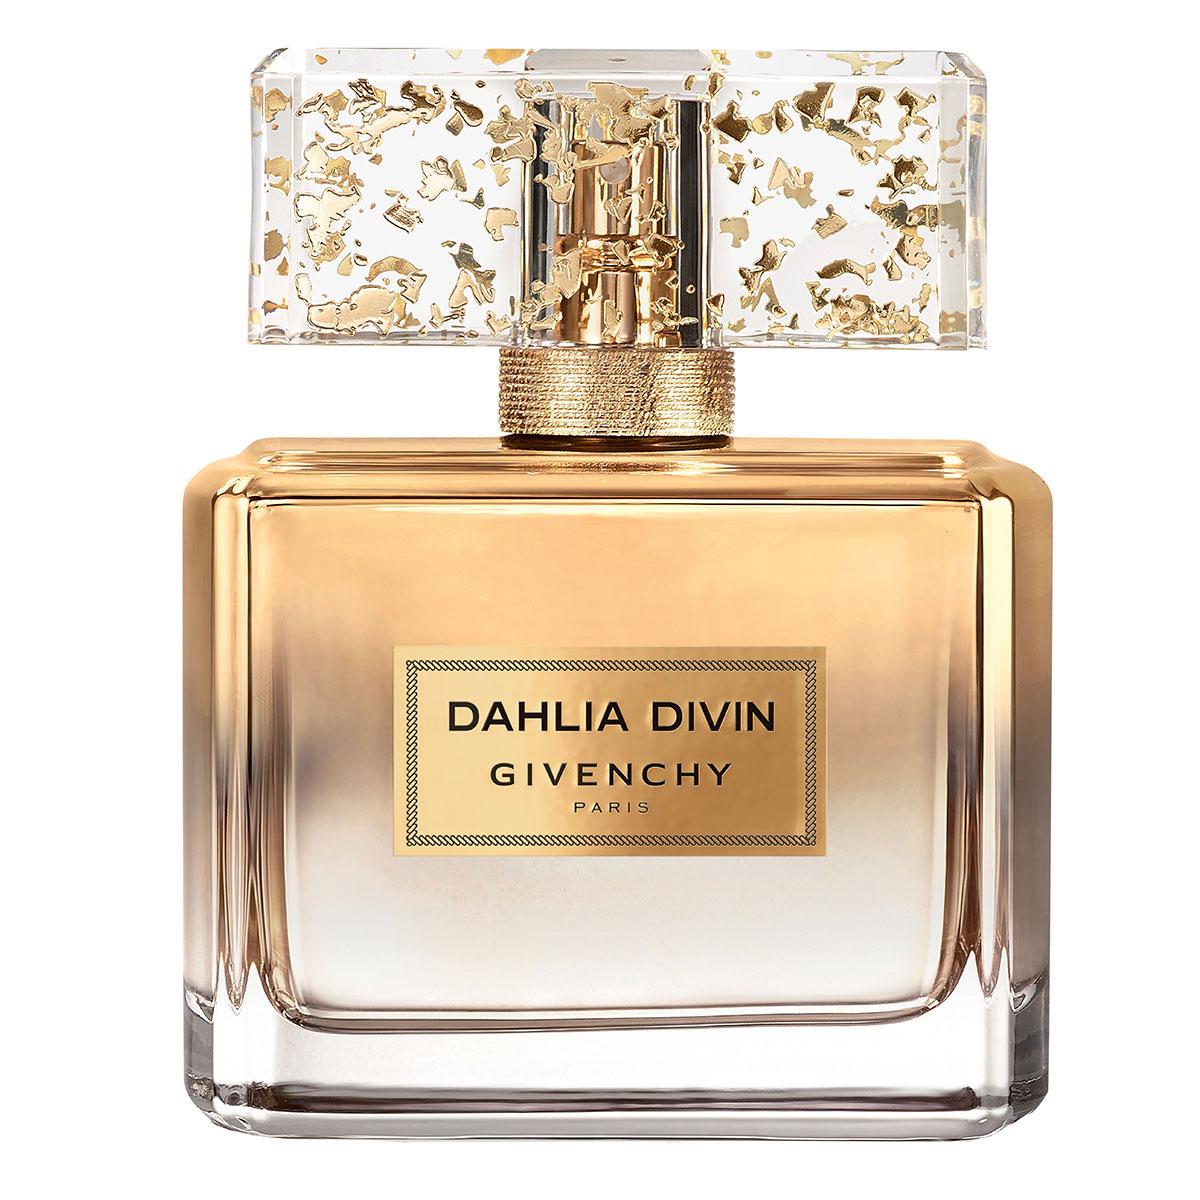 Givenchy – Dahlia Divin Le Nectar de Parfum (EDP)